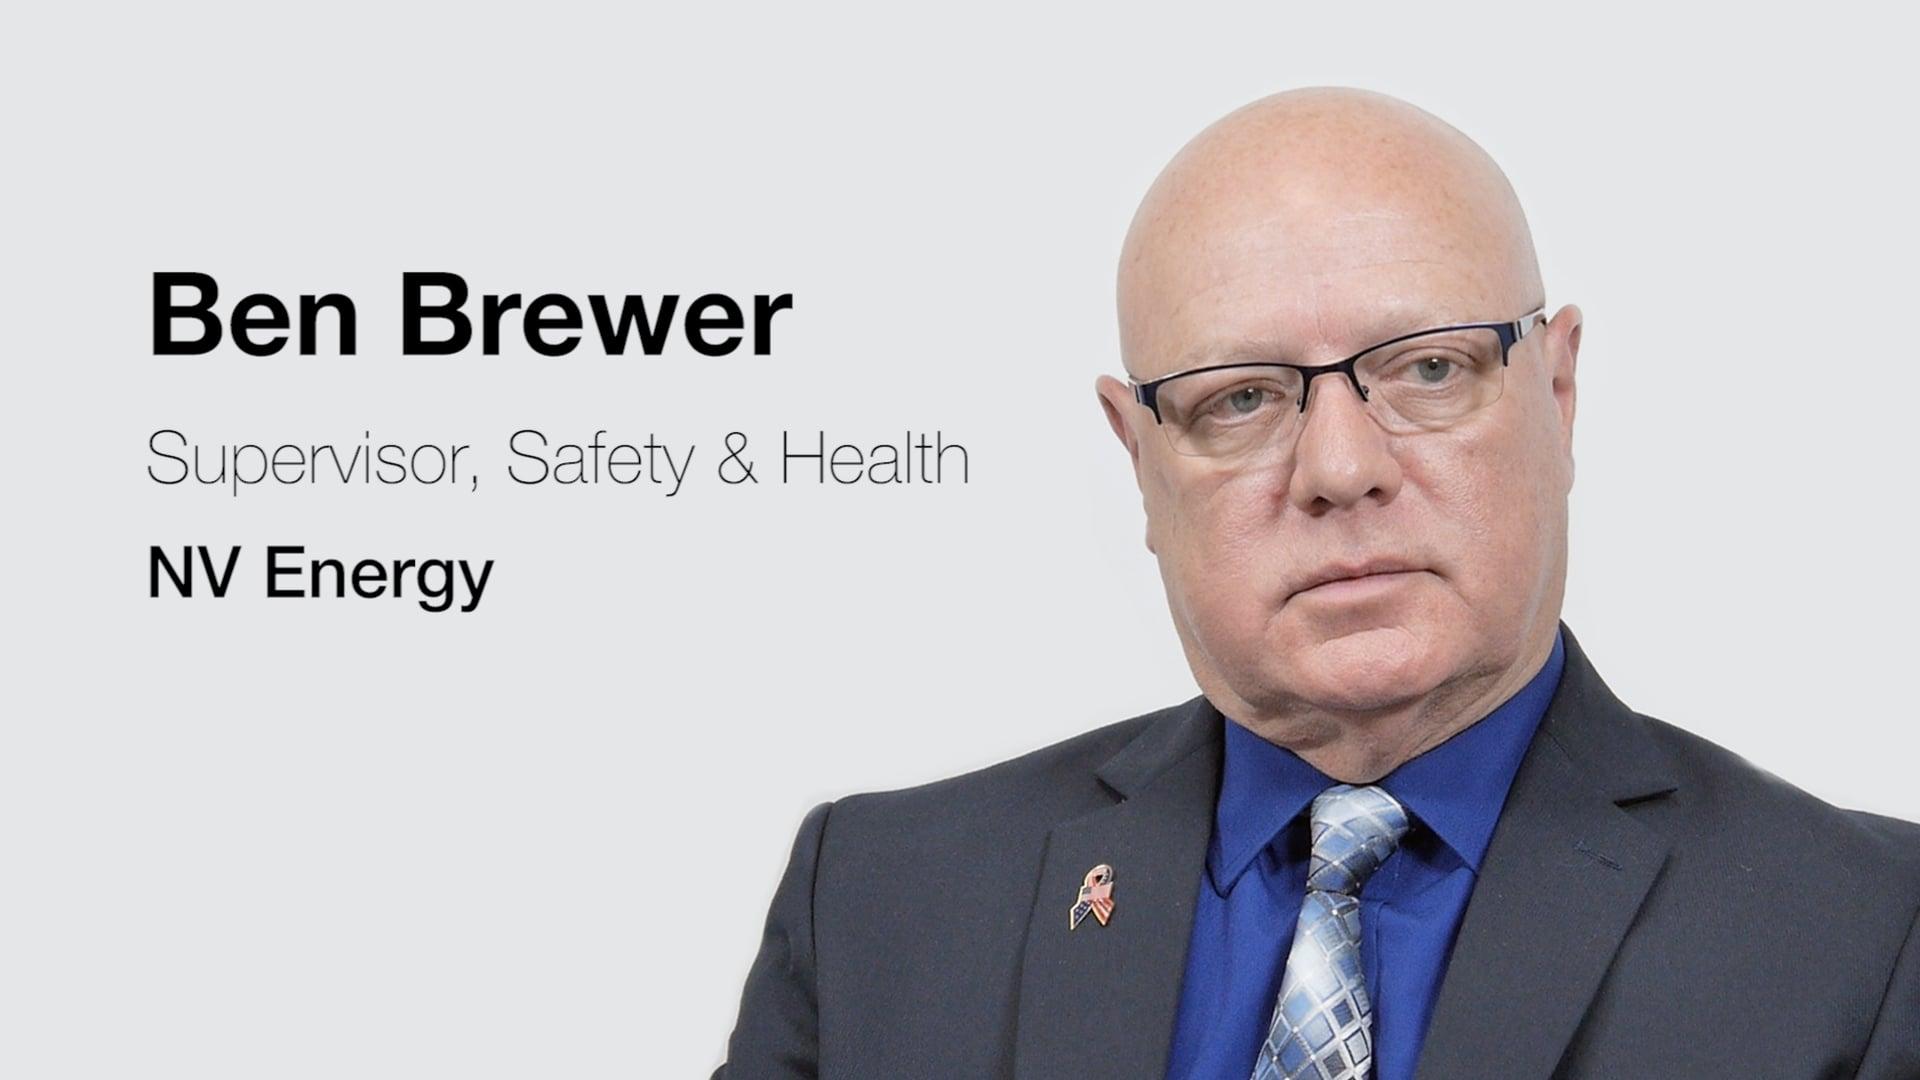 NV Energy | Ben Brewer